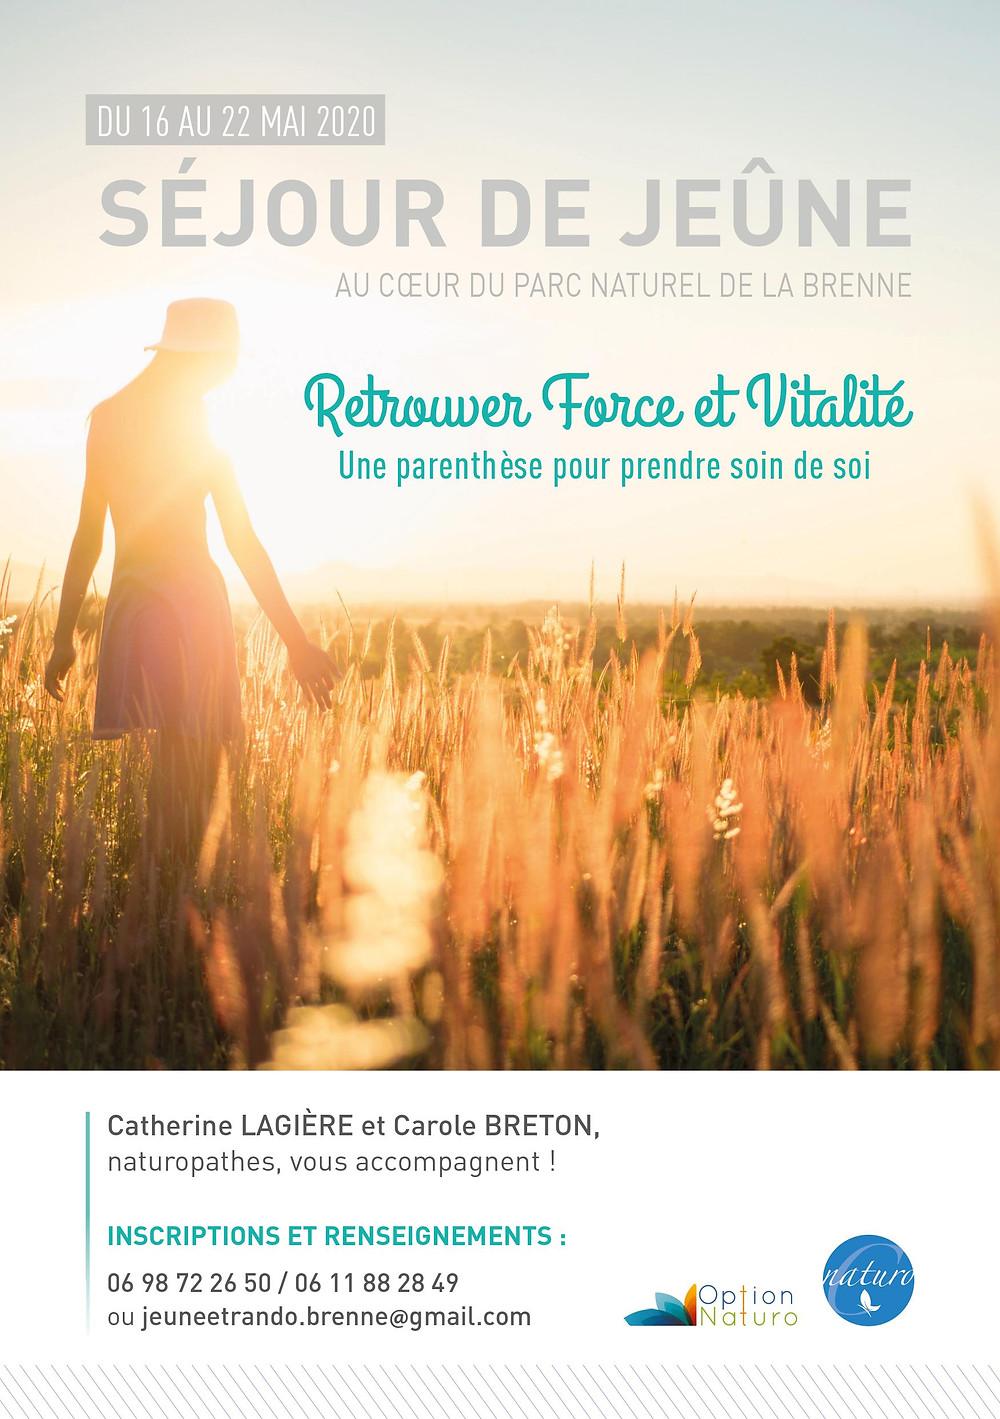 Séjour de jeûne avec Carole Breton